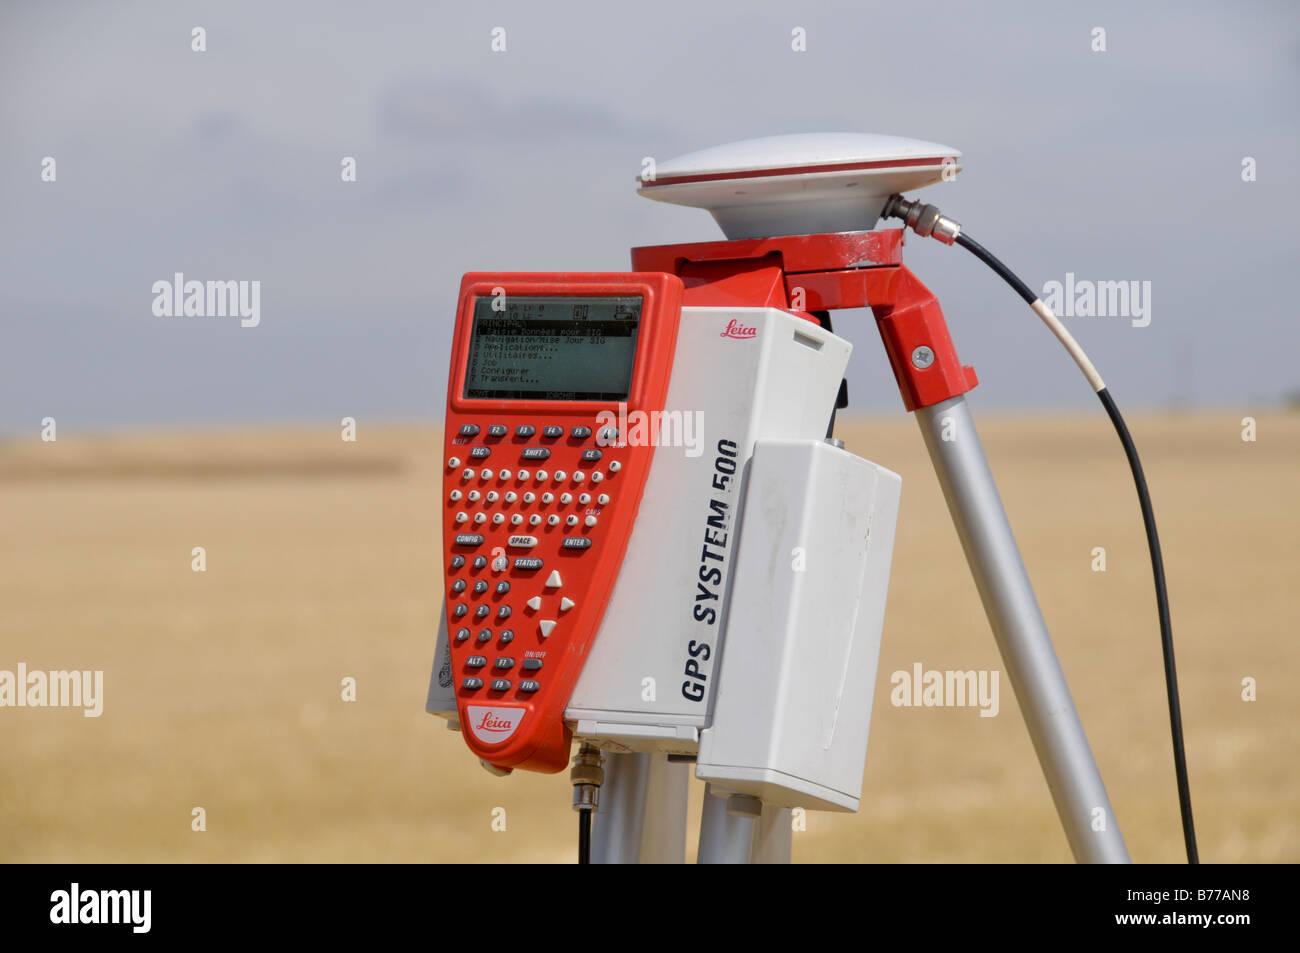 GPS differential DGPS Stock Photo: 21675060 - Alamy